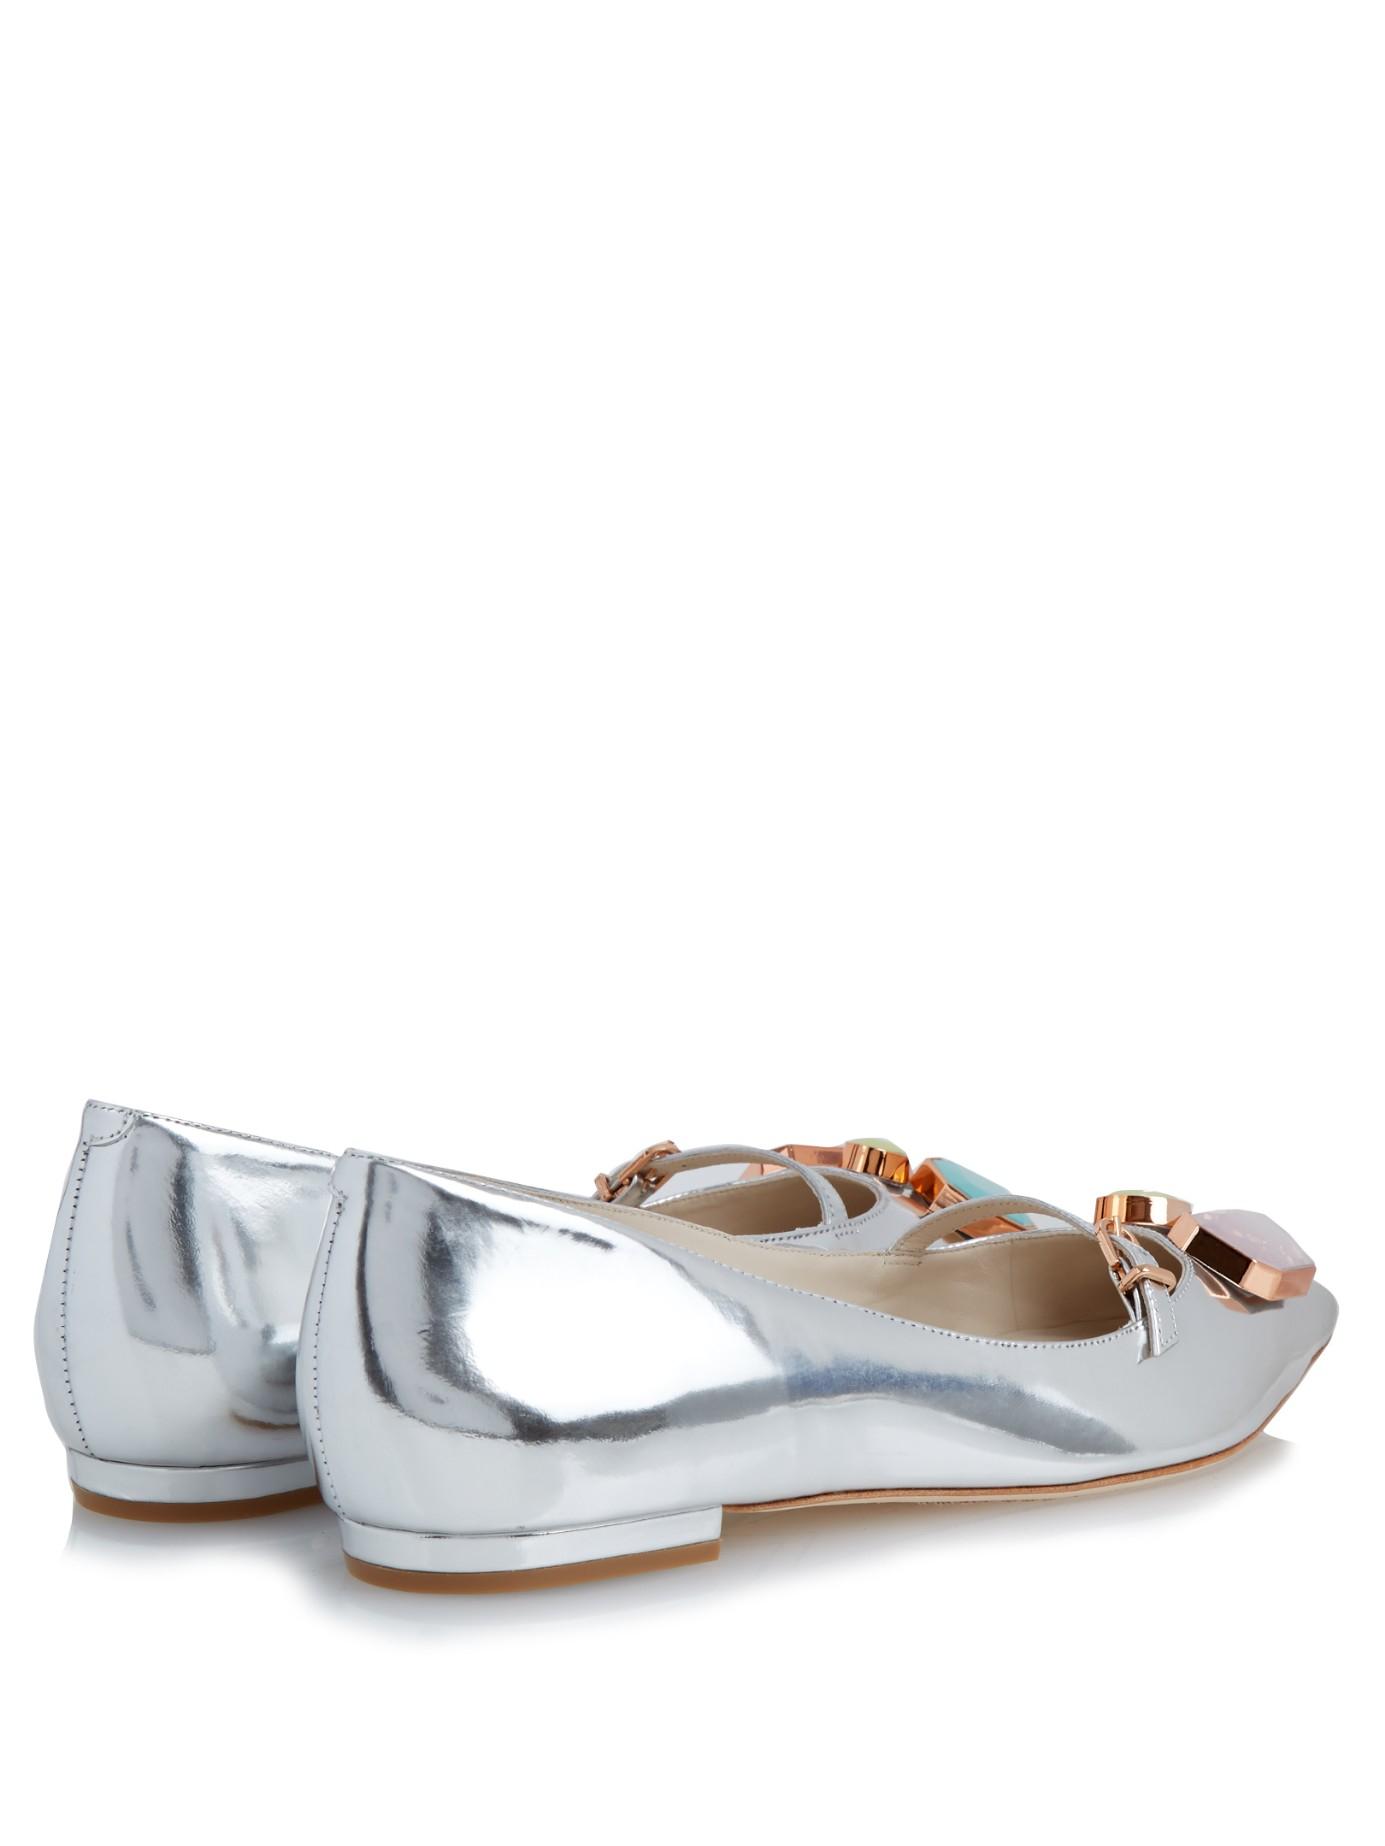 Sophia Webster Embellished Metallic Flats 100% authentic online GO2wO0l